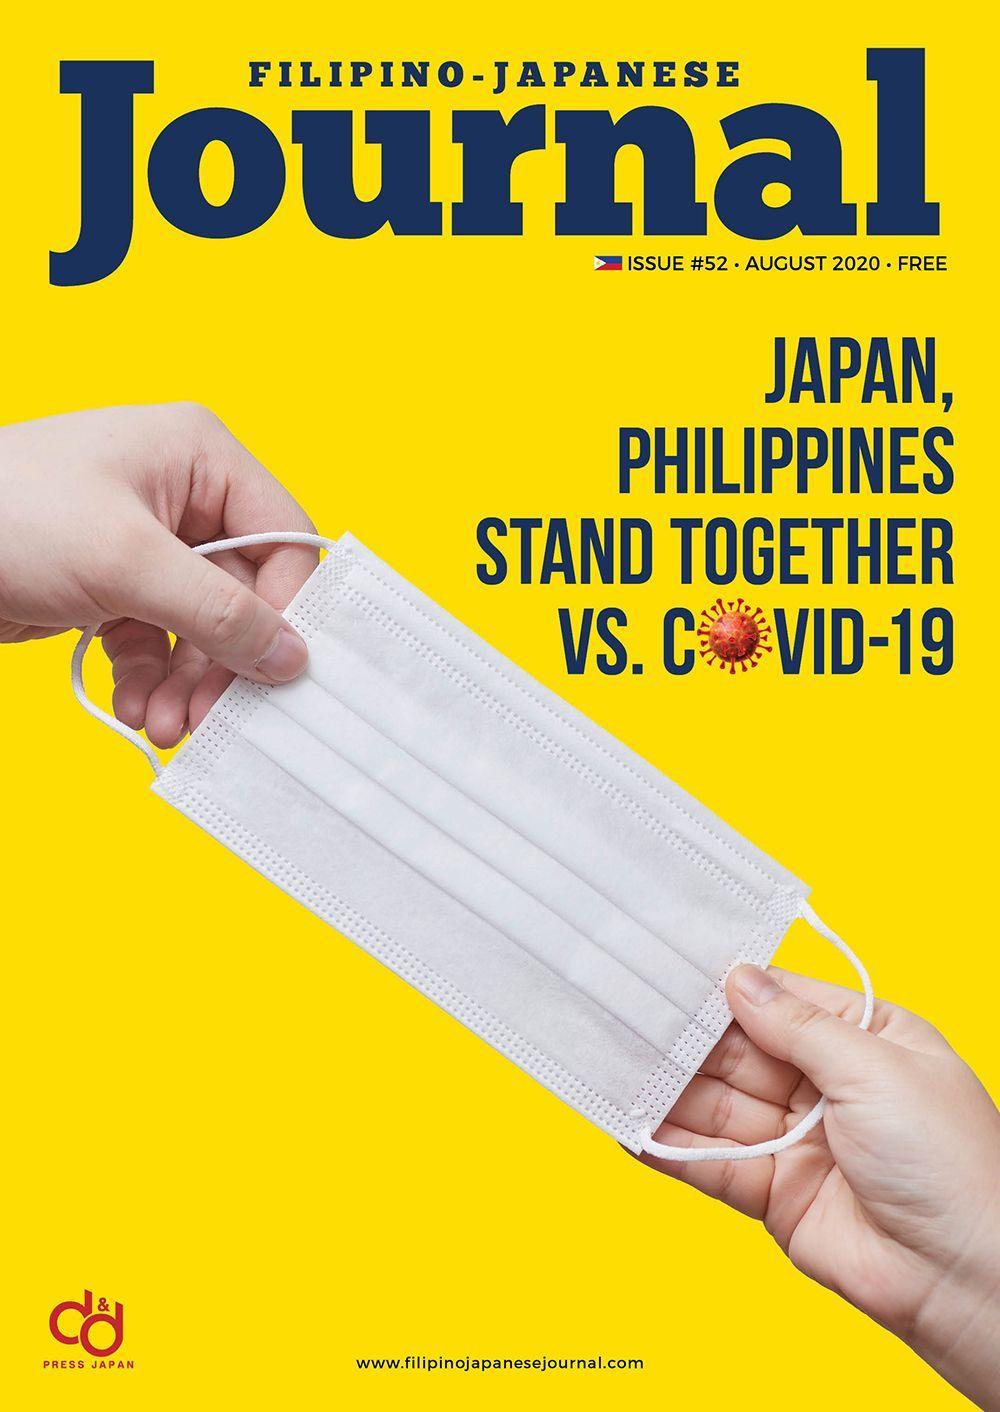 Filipino-Japanese Journal to Make a Print Comeback